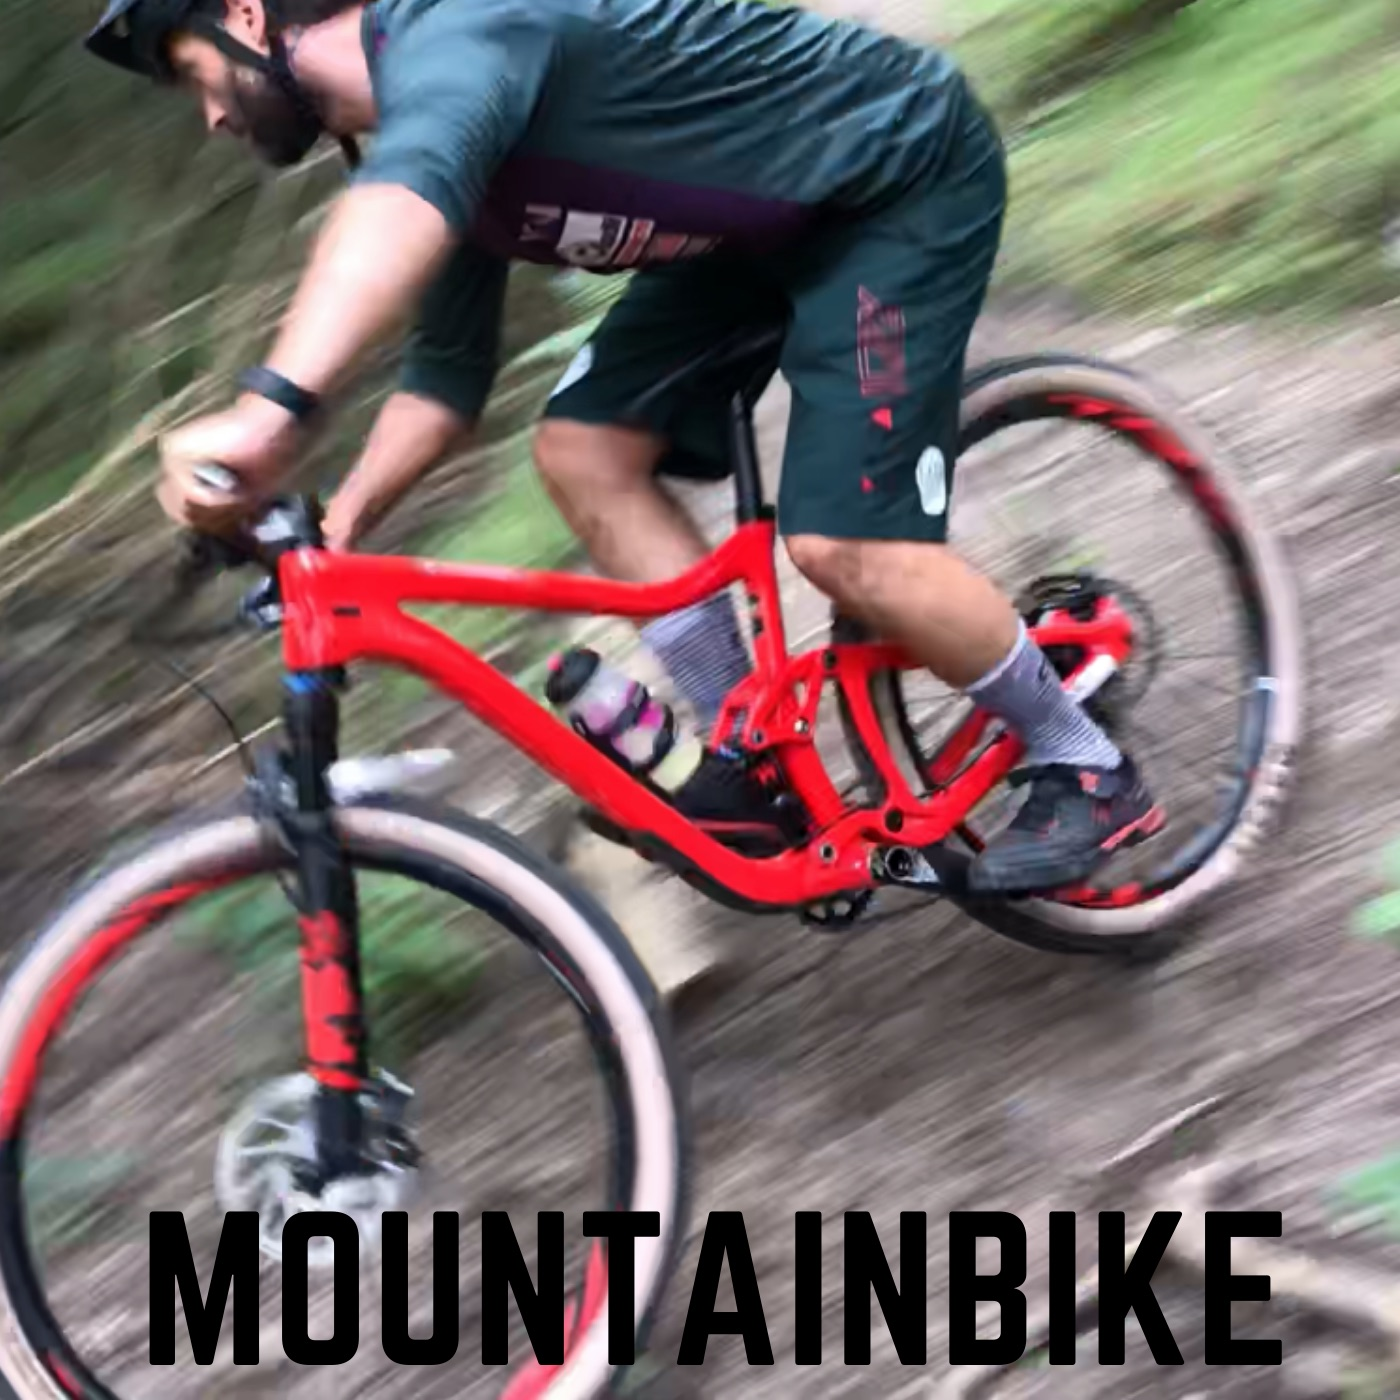 Mountainbike podcast